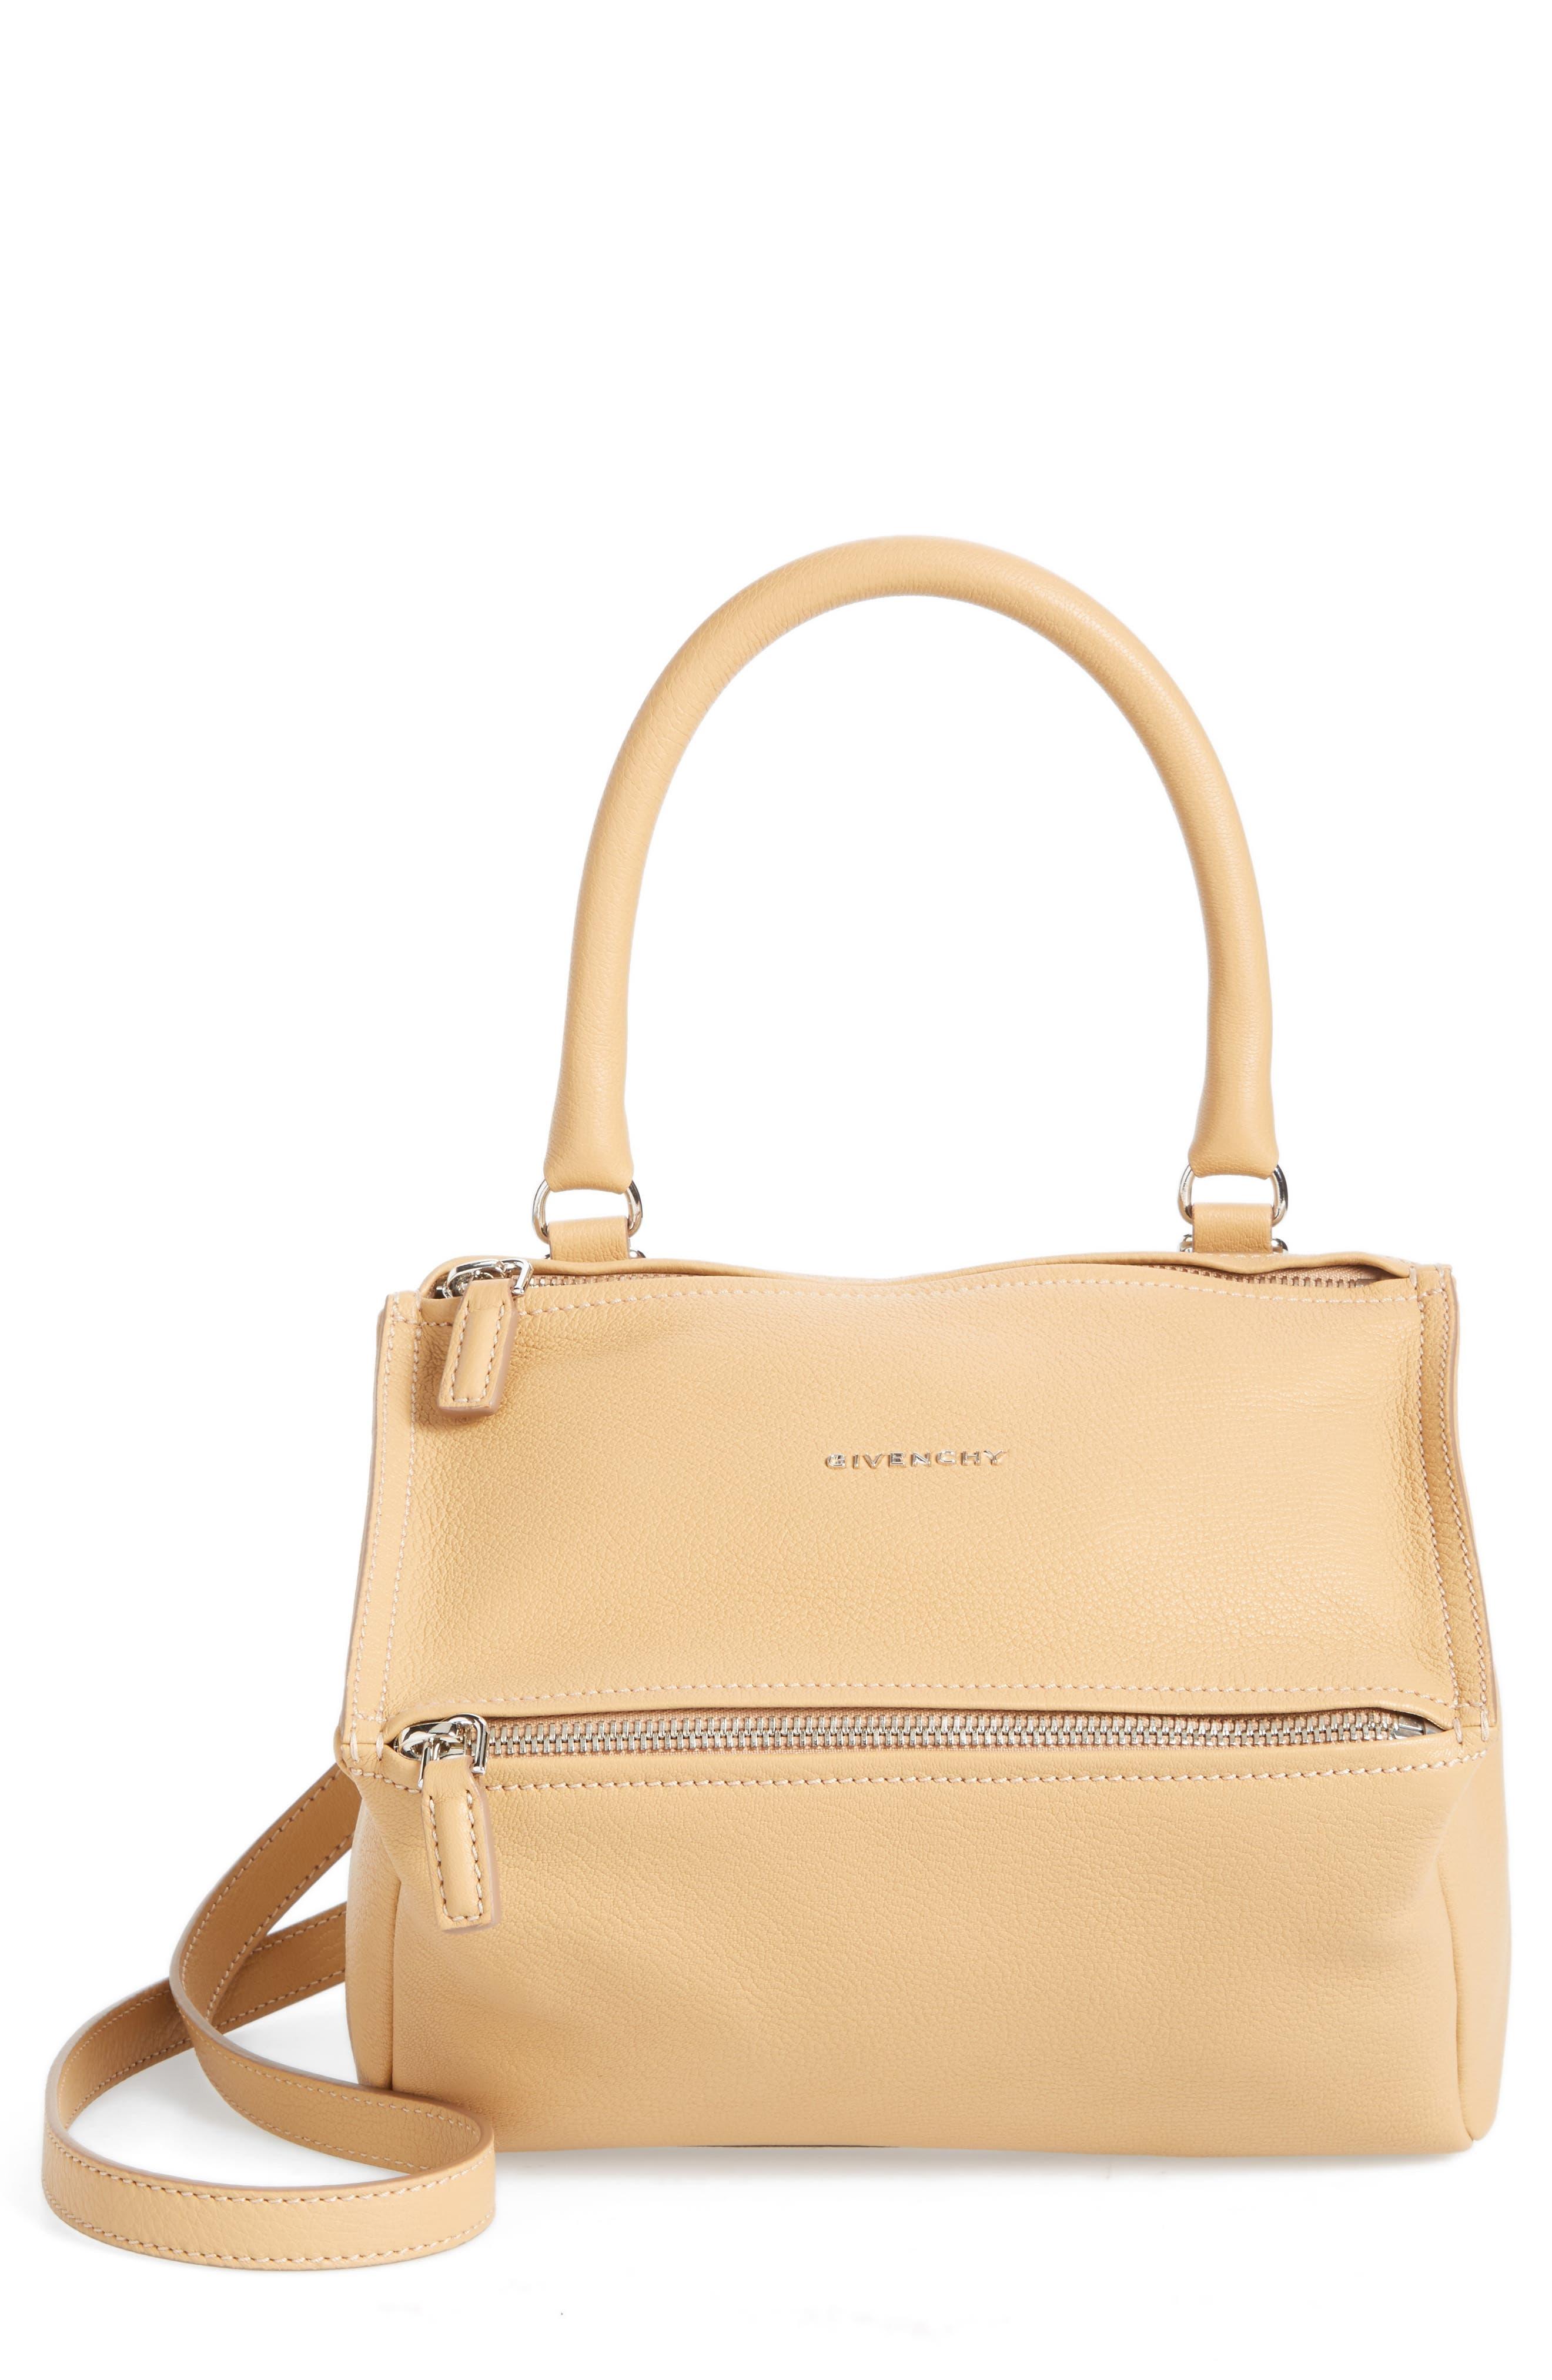 Main Image - Givenchy 'Small Pandora' Leather Satchel